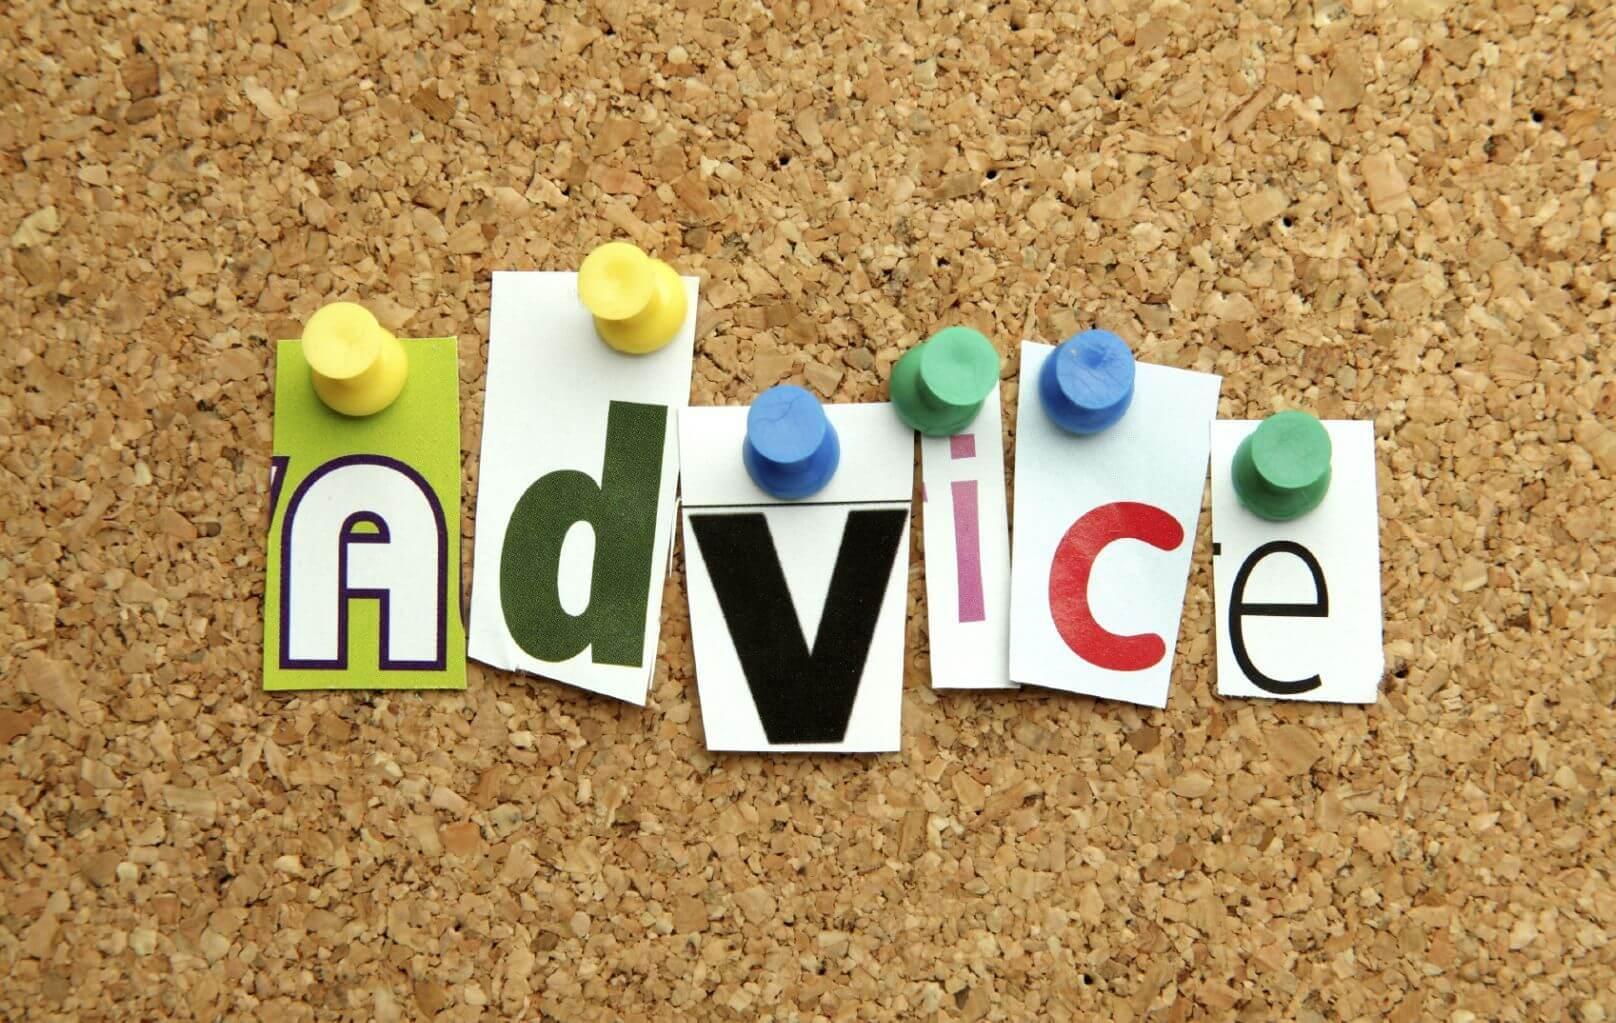 Advice tacked up on corkboard